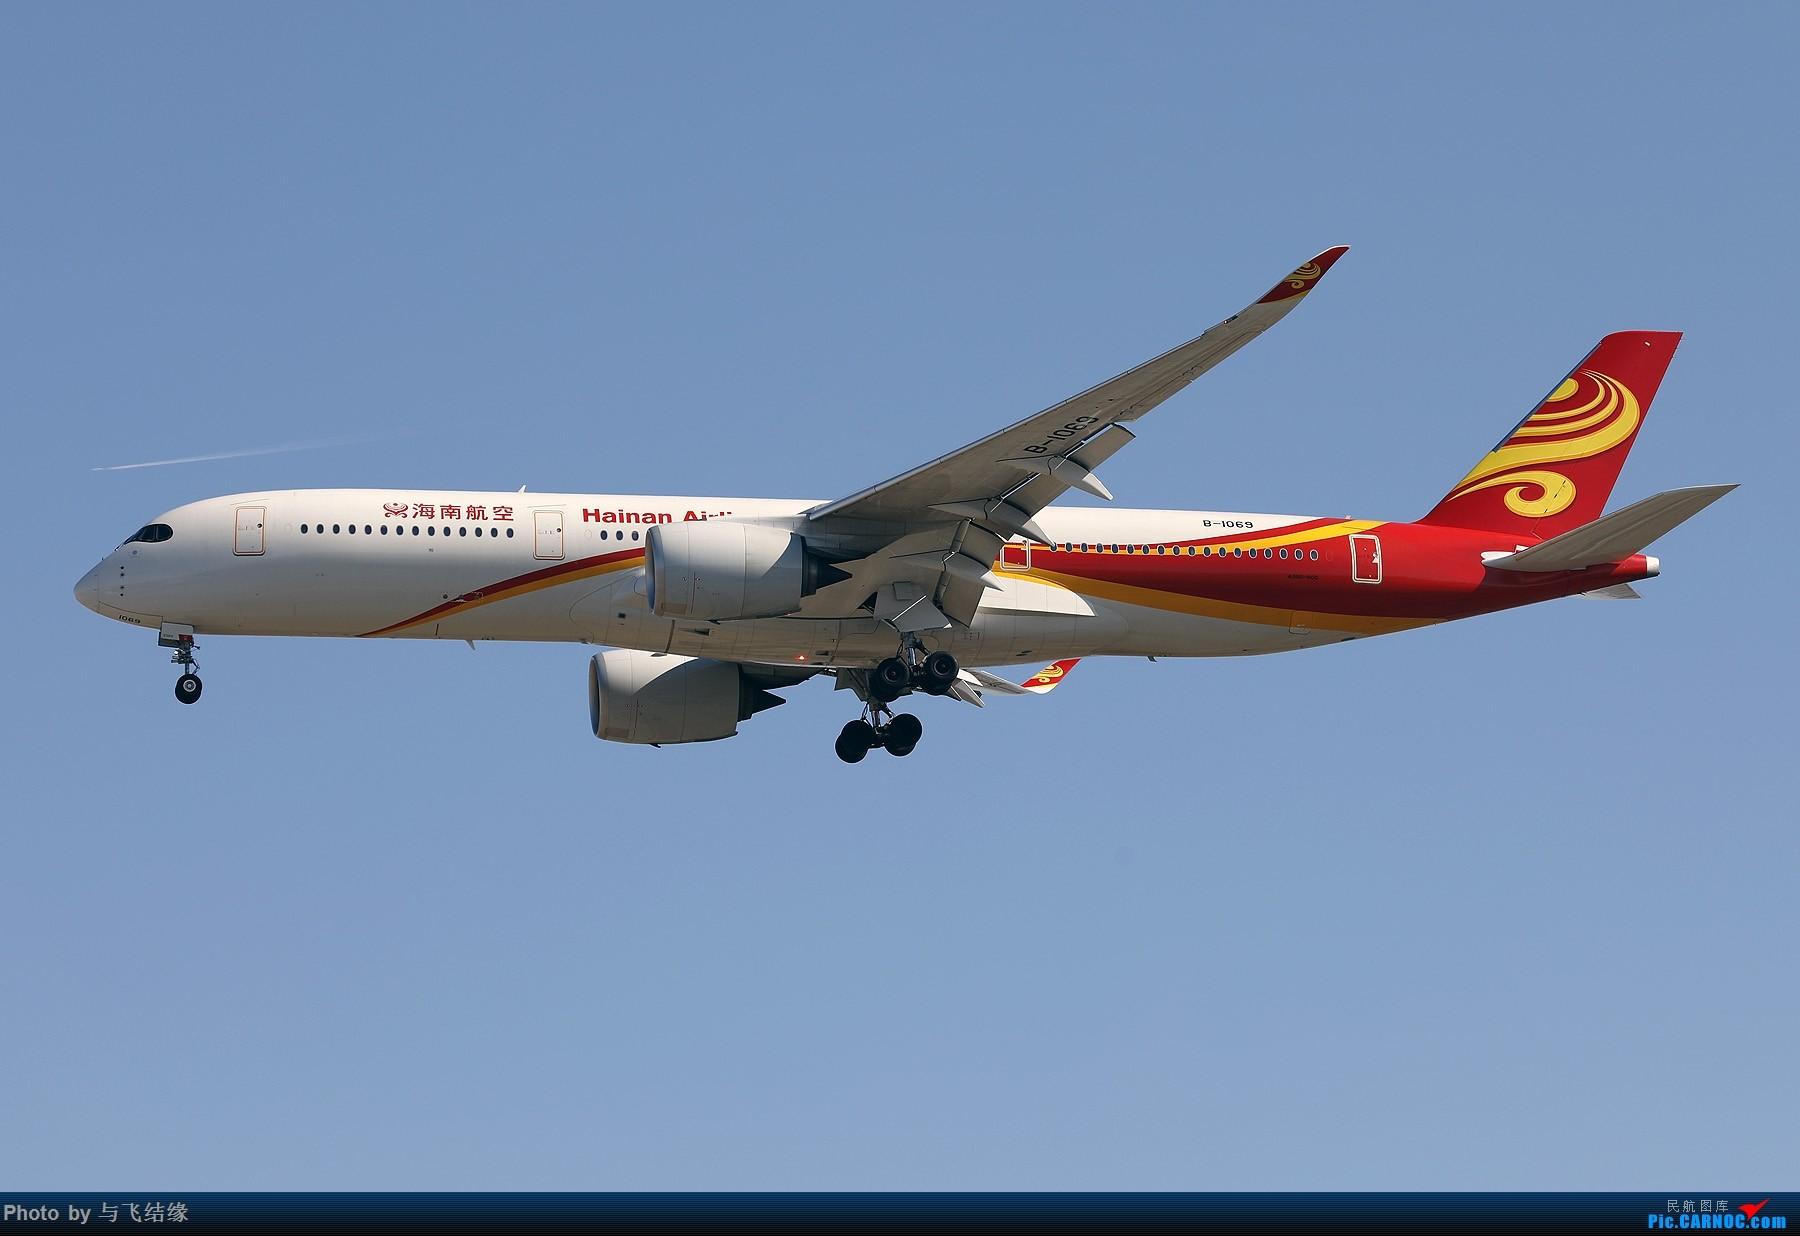 Re:[原创]以色列航空波音777-200、加拿大航空波音77W新装、国航最新空客350-900. AIRBUS A350-900 B-1069 中国北京首都国际机场